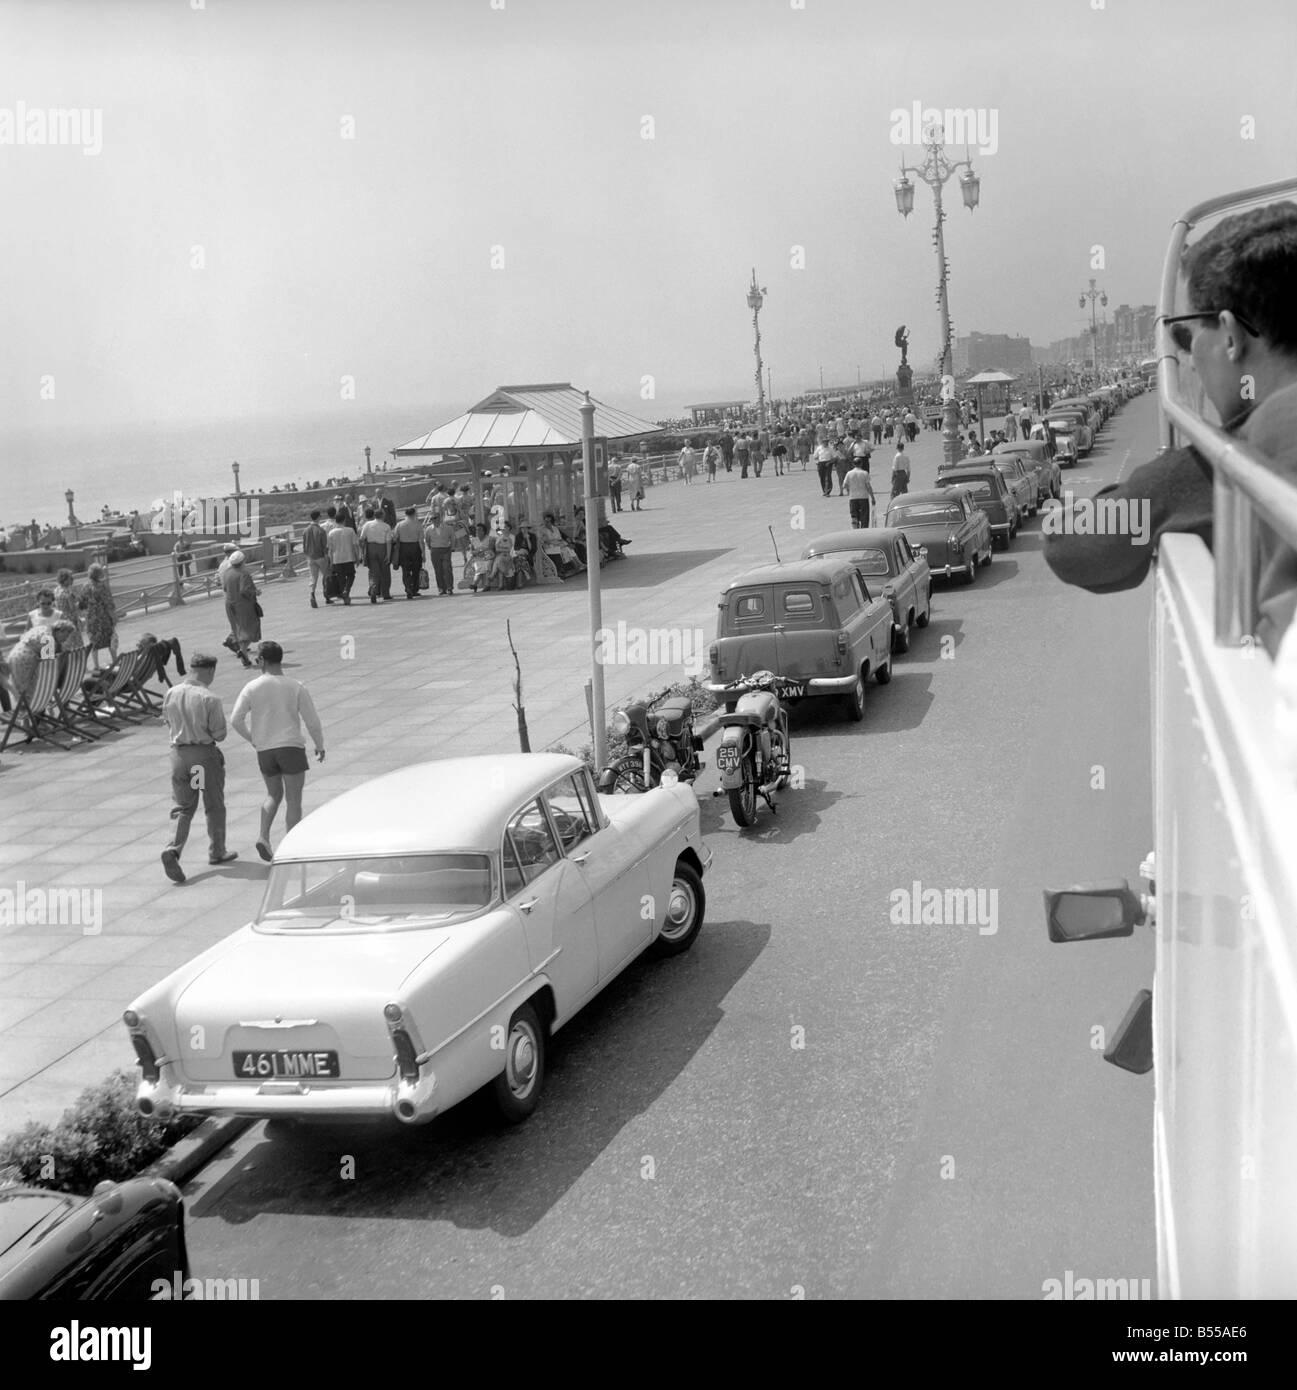 Traffic/Parked cars, street scene. June 1960 M4336-001 - Stock Image